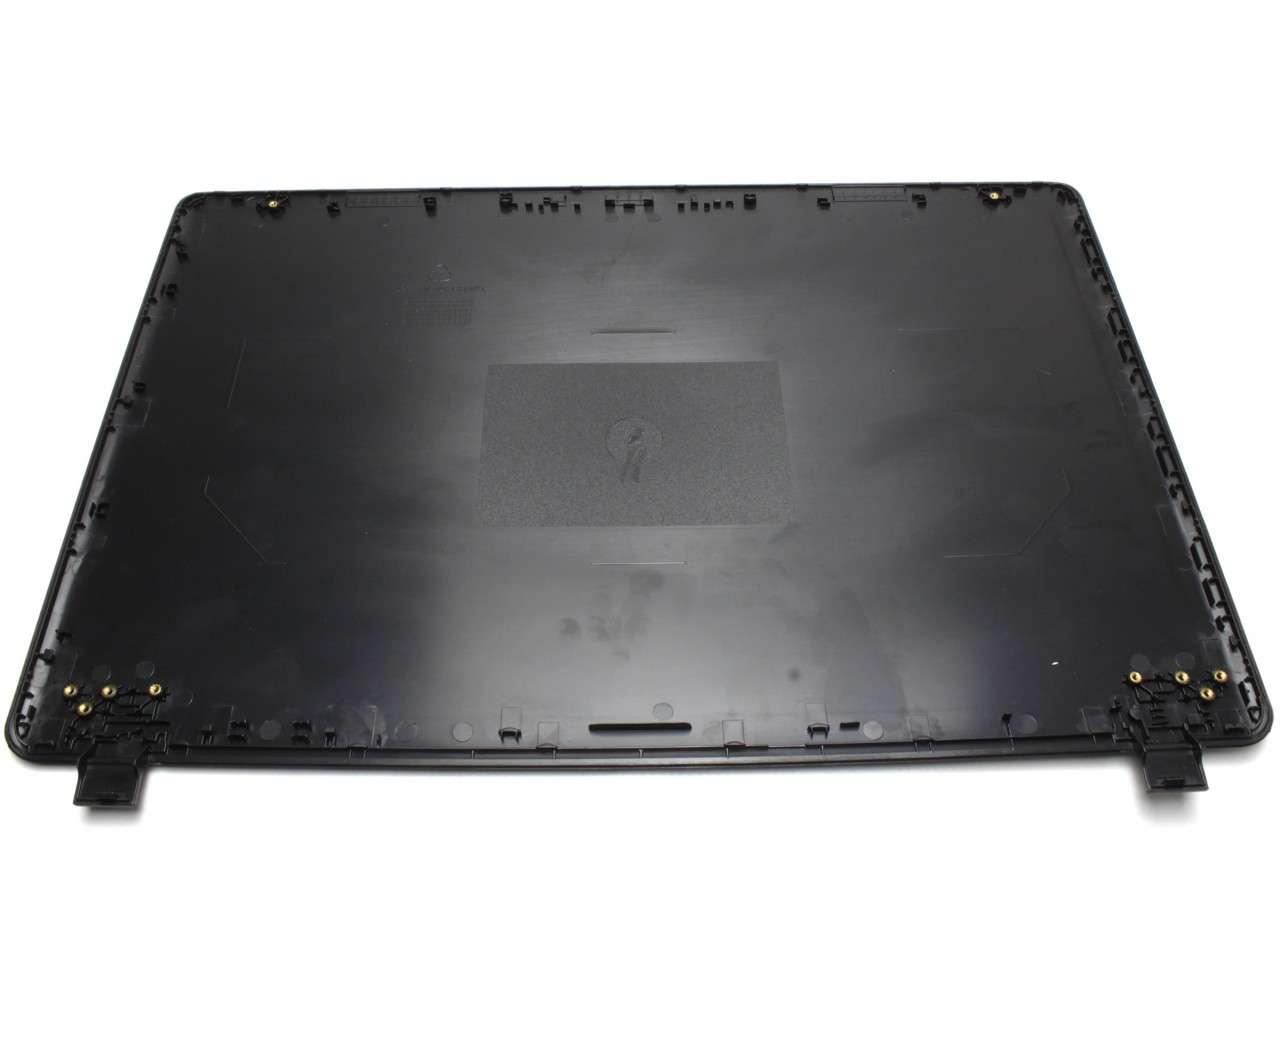 Capac Display BackCover Acer Extensa 2540 Carcasa Display imagine powerlaptop.ro 2021